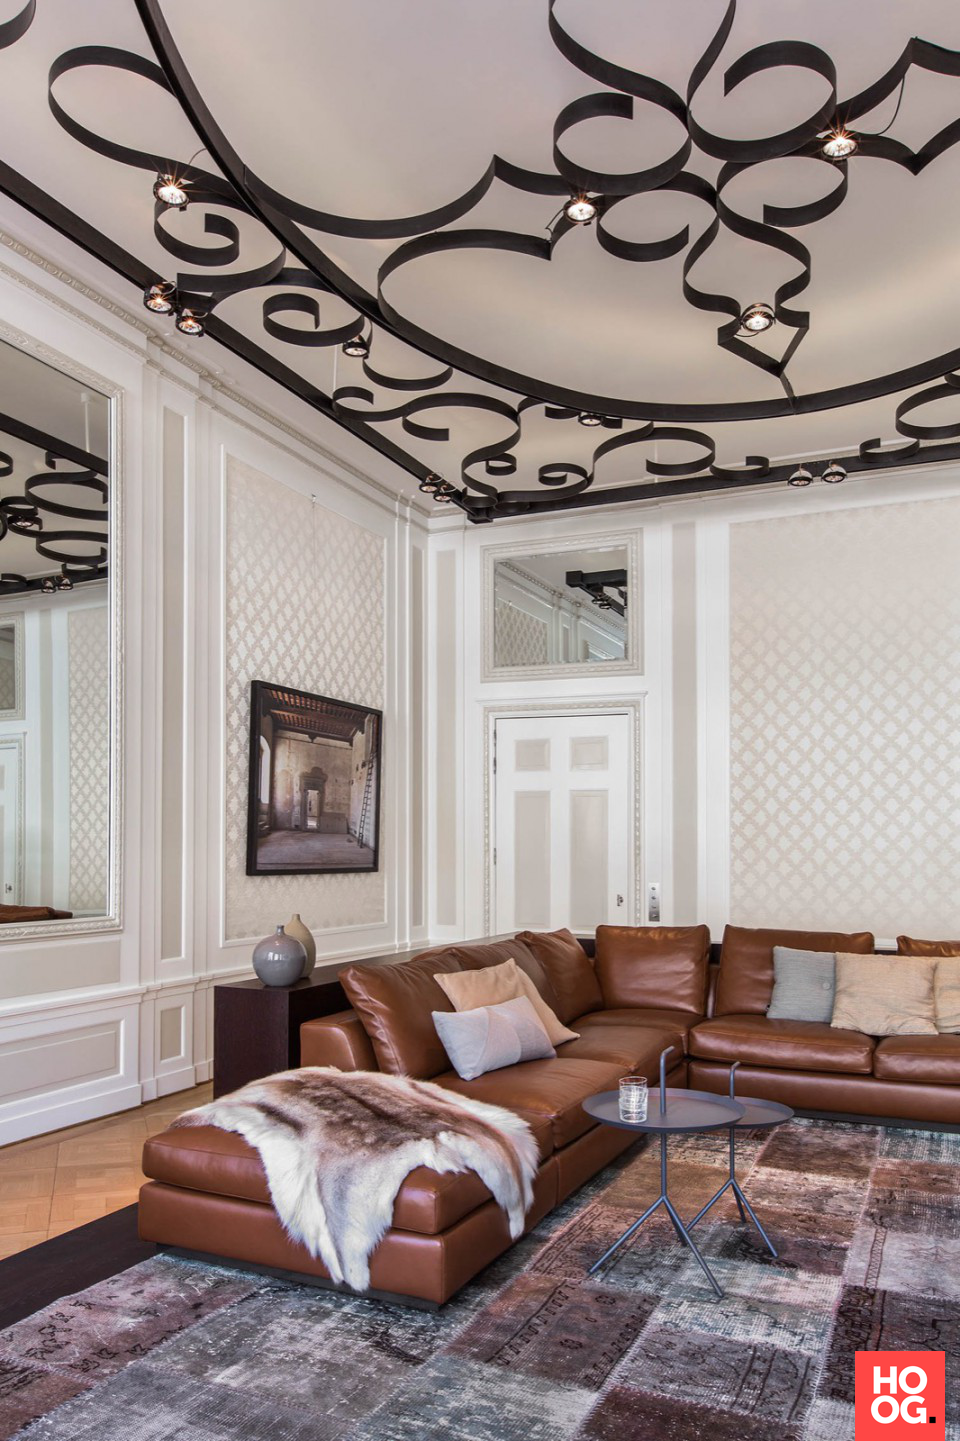 Design woonkamer met luxe meubels | interieur ideeën | woonkamer ...